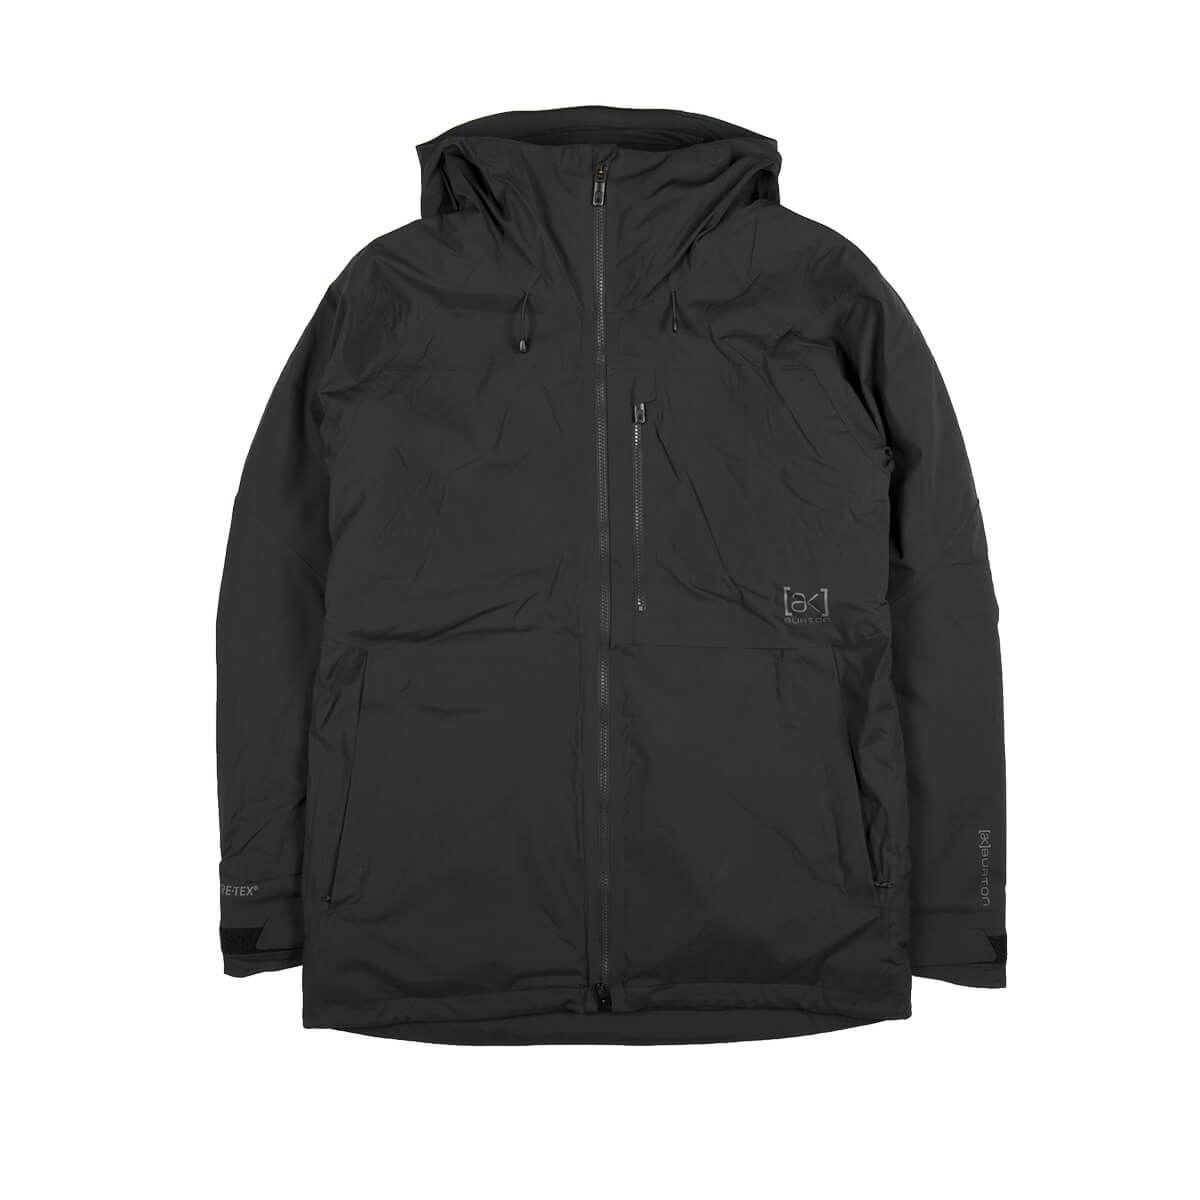 BURTON Goretex Helitack Jacket in Black